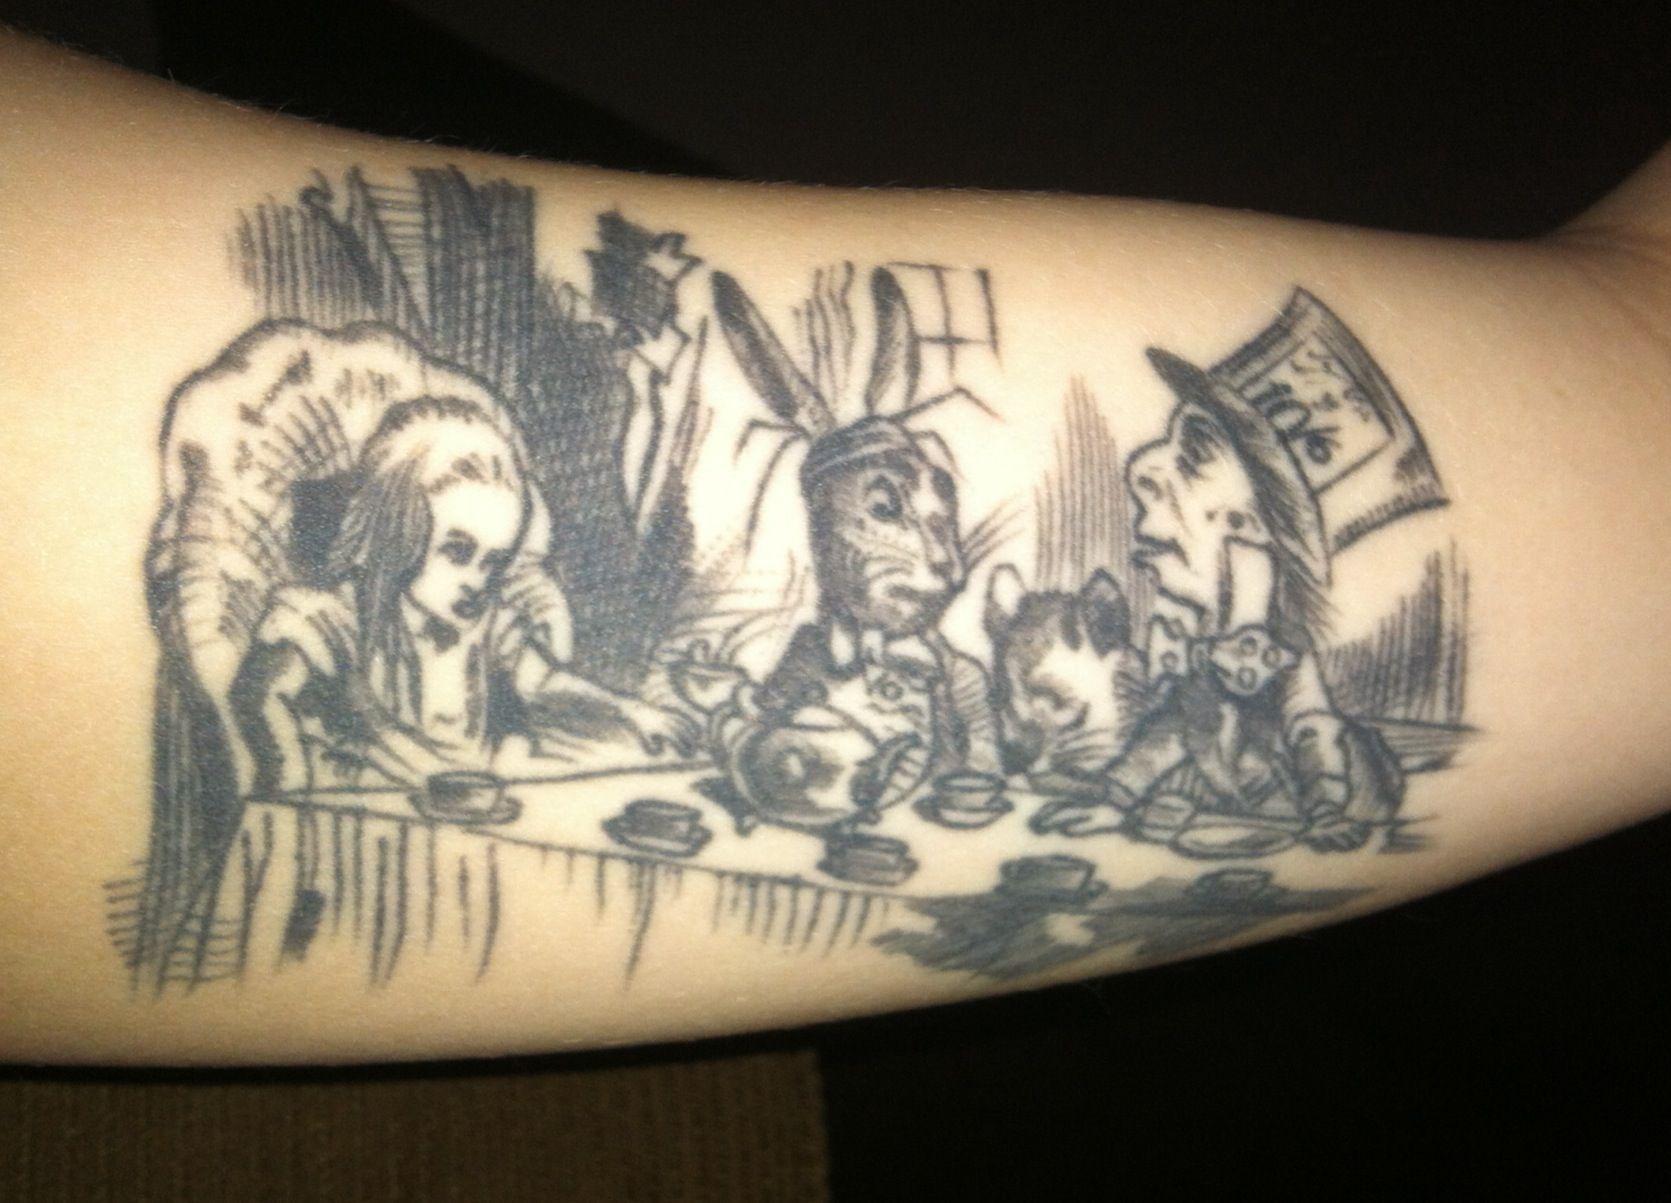 Alice in Wonderland Tattoos - Inspiring Tattoos  |Alice Tea Tattoo